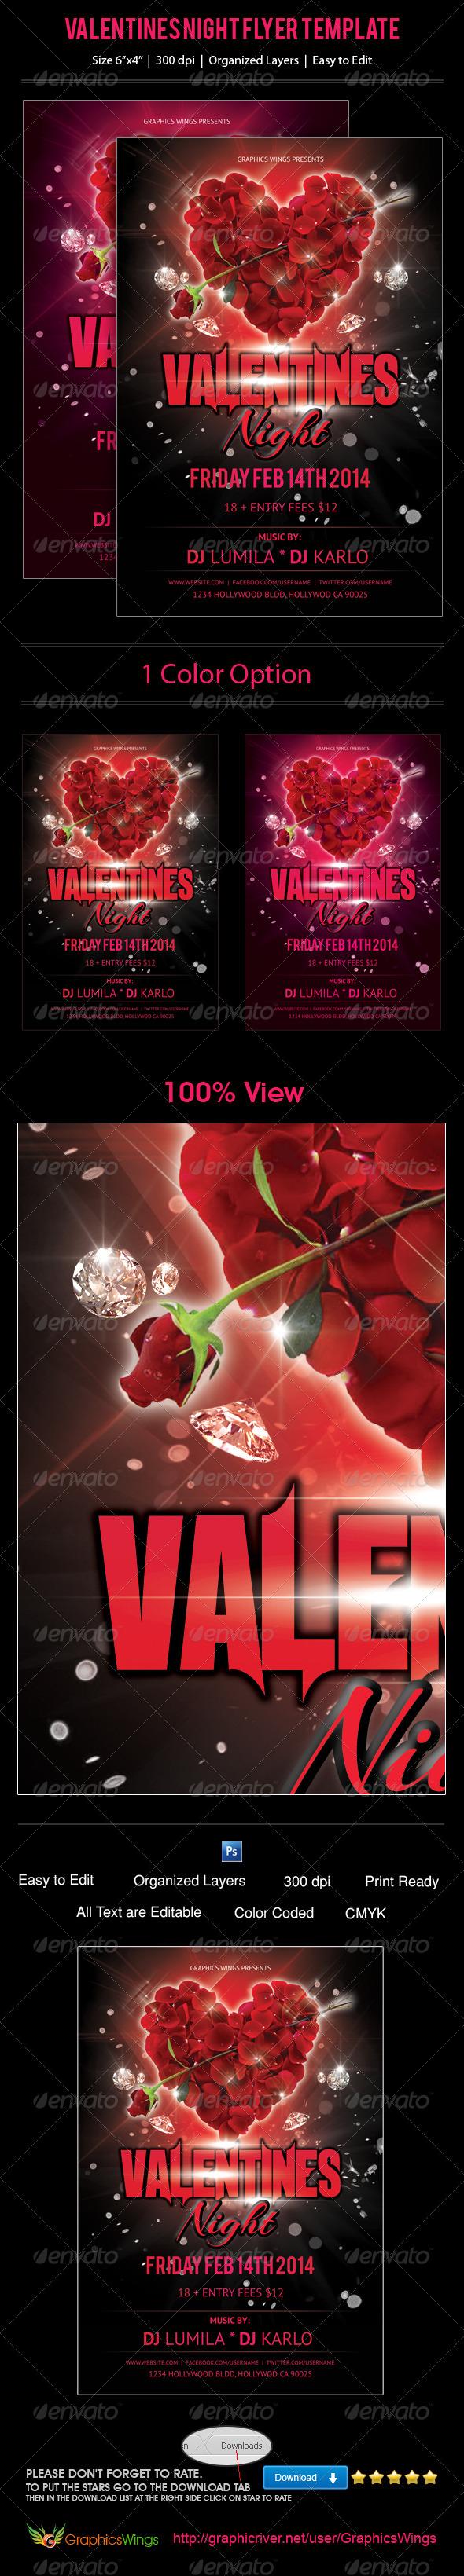 Valentines Night Flyer Template